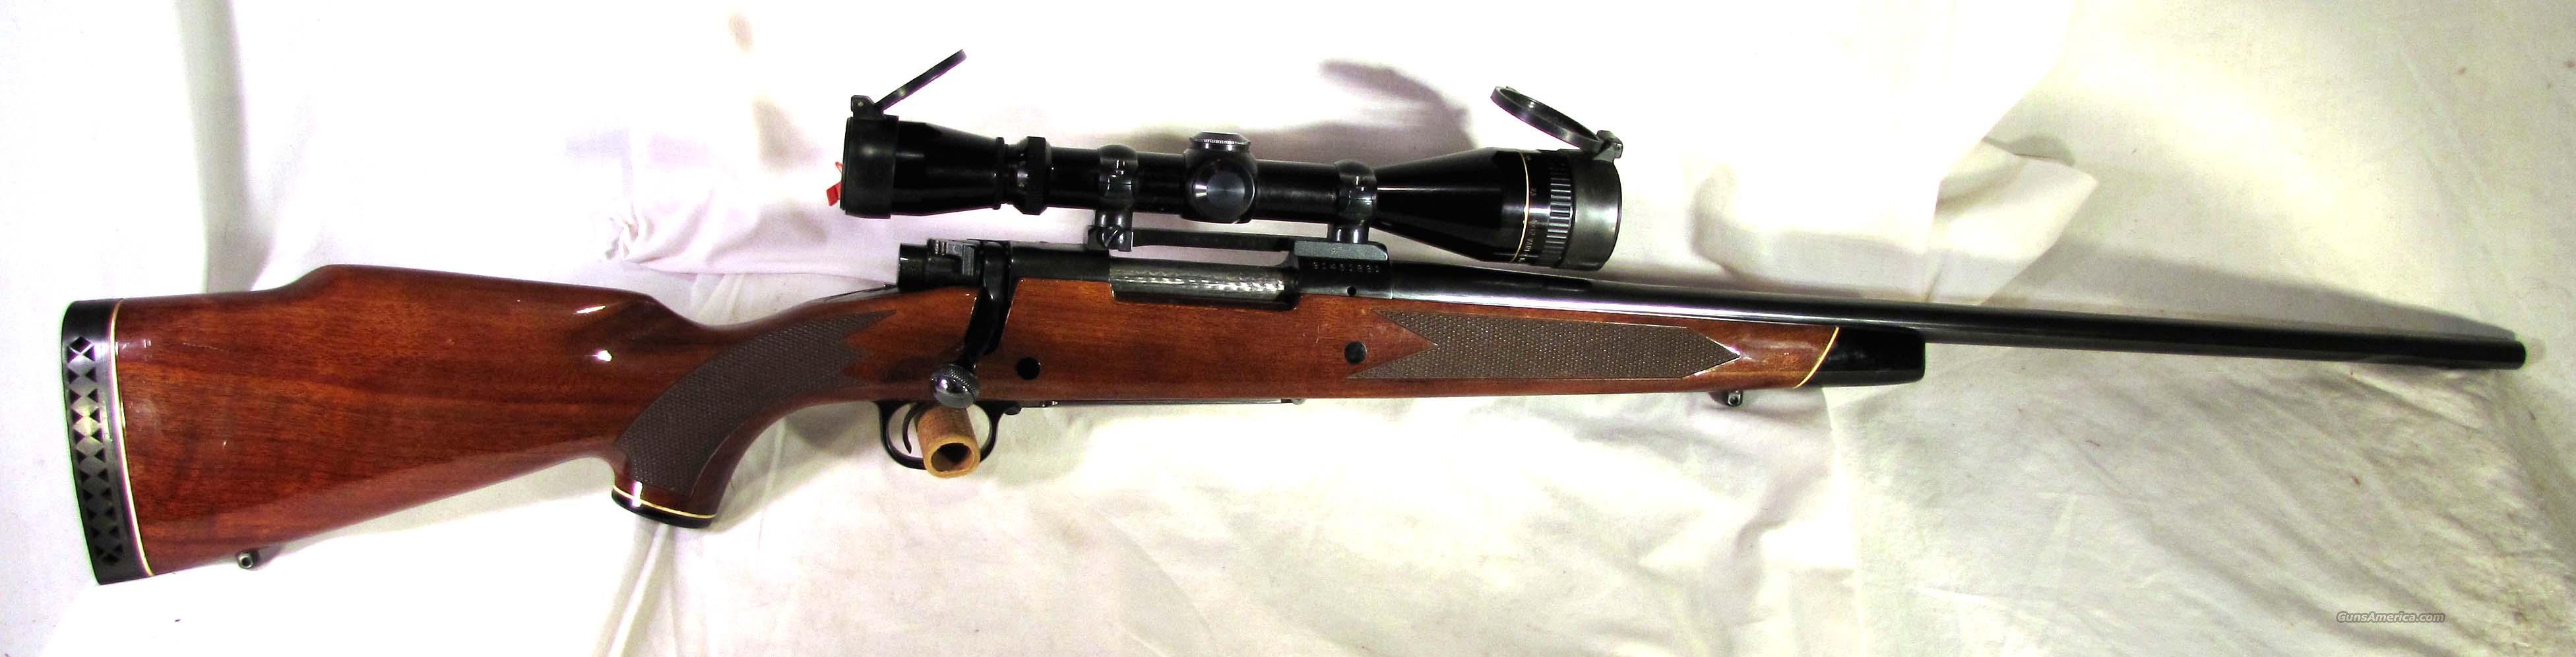 Winchester Model 70 XTR - 7mm REM Mag